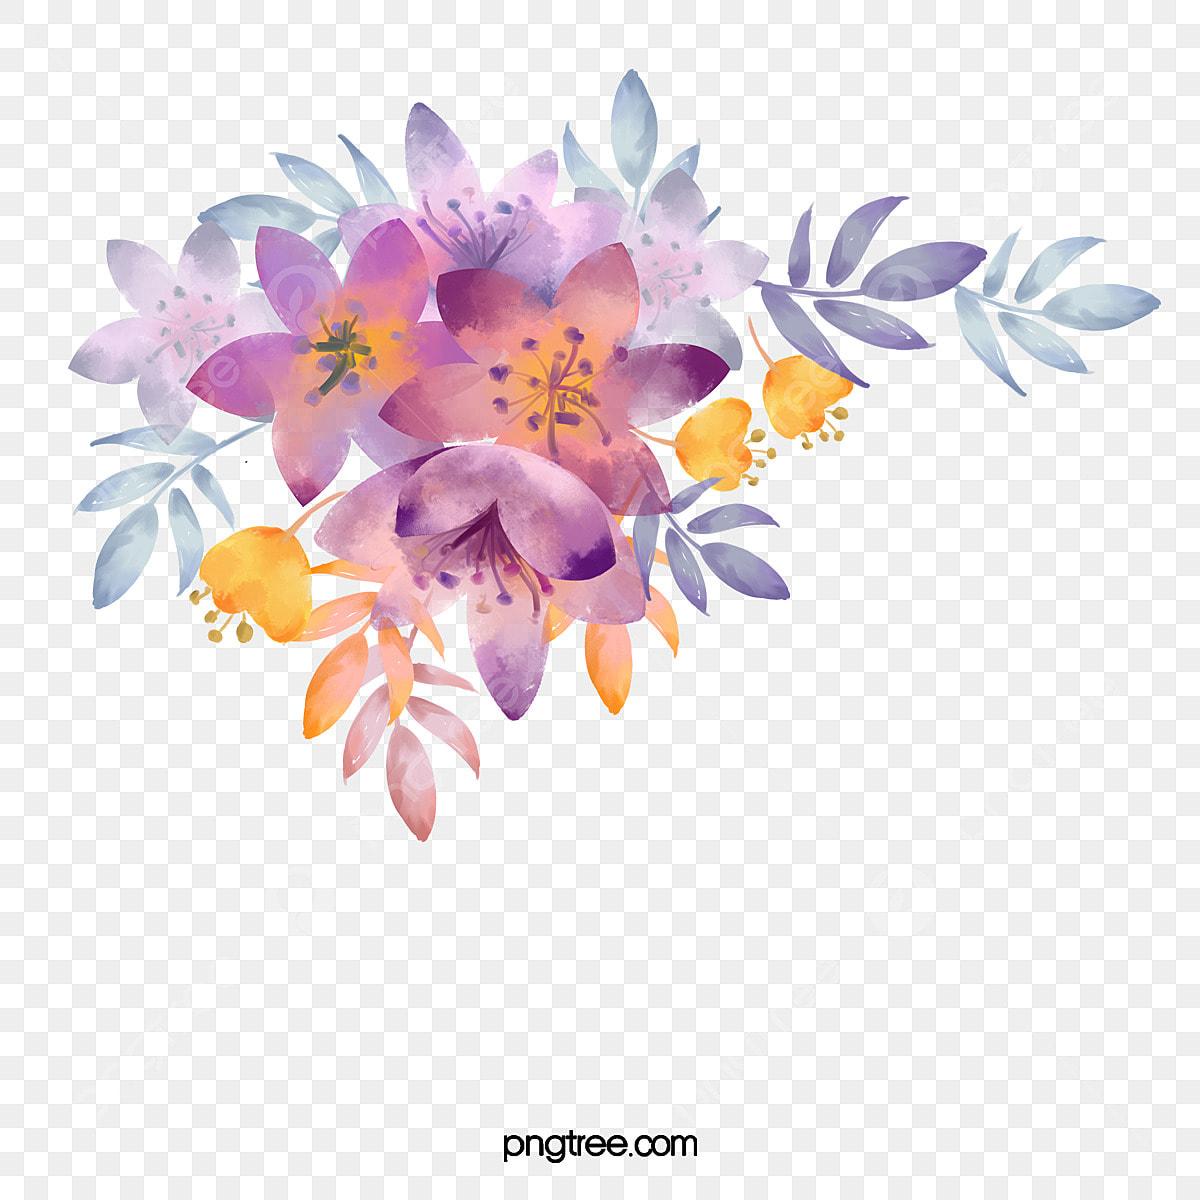 Material De Pintura A Guache Aquarela De Flores Românticas